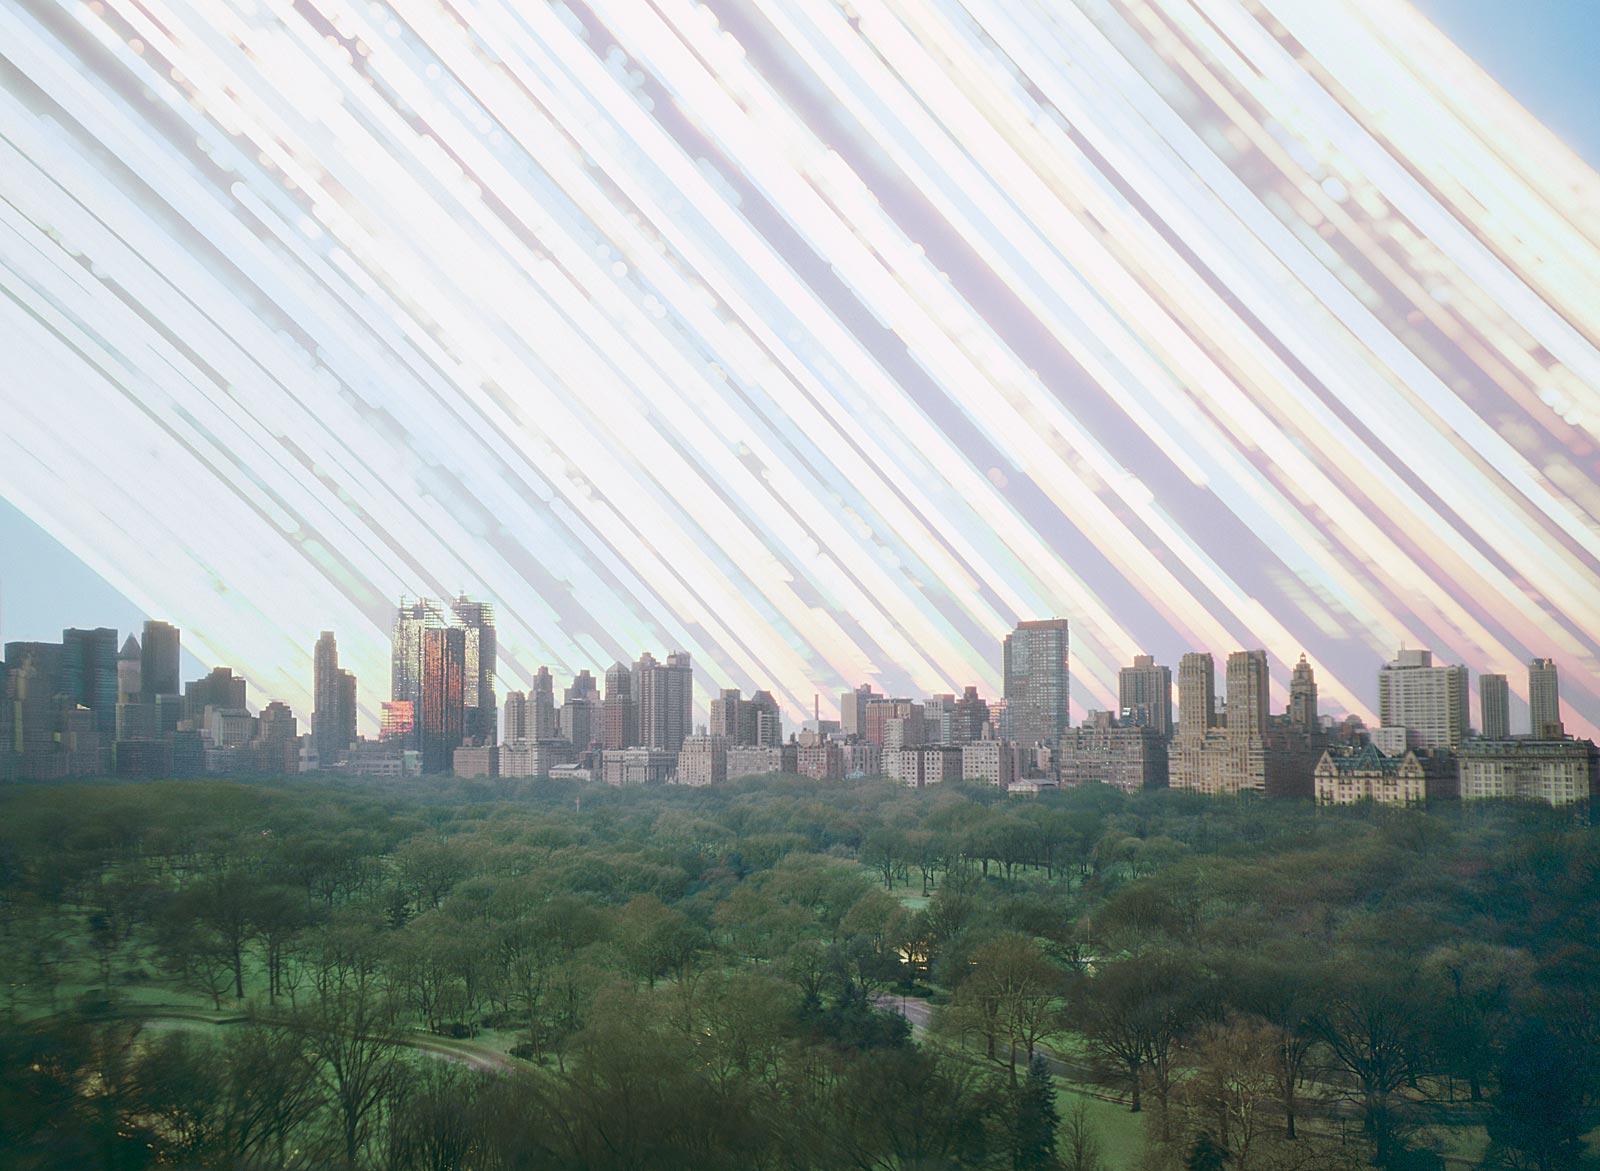 Central Park, New York (18.10.2002 - 18.10.2003)